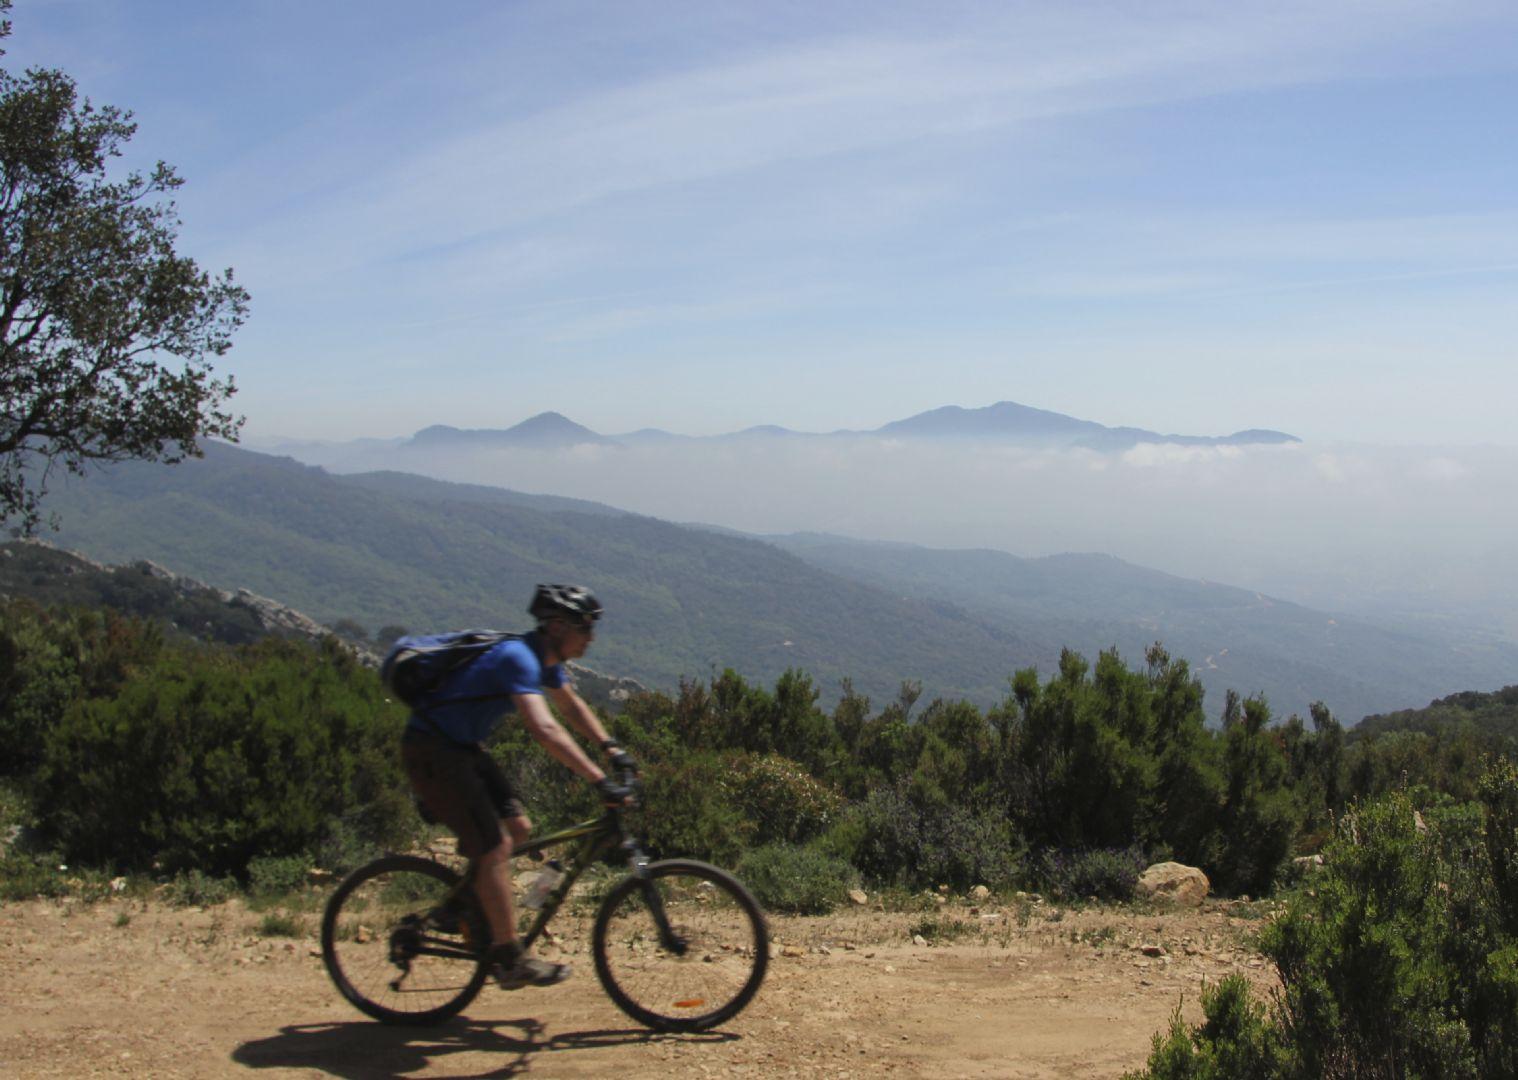 mountainbikingspain4.jpg - Spain - Ruta de la Plata - Guided Mountain Bike Holiday - Mountain Biking